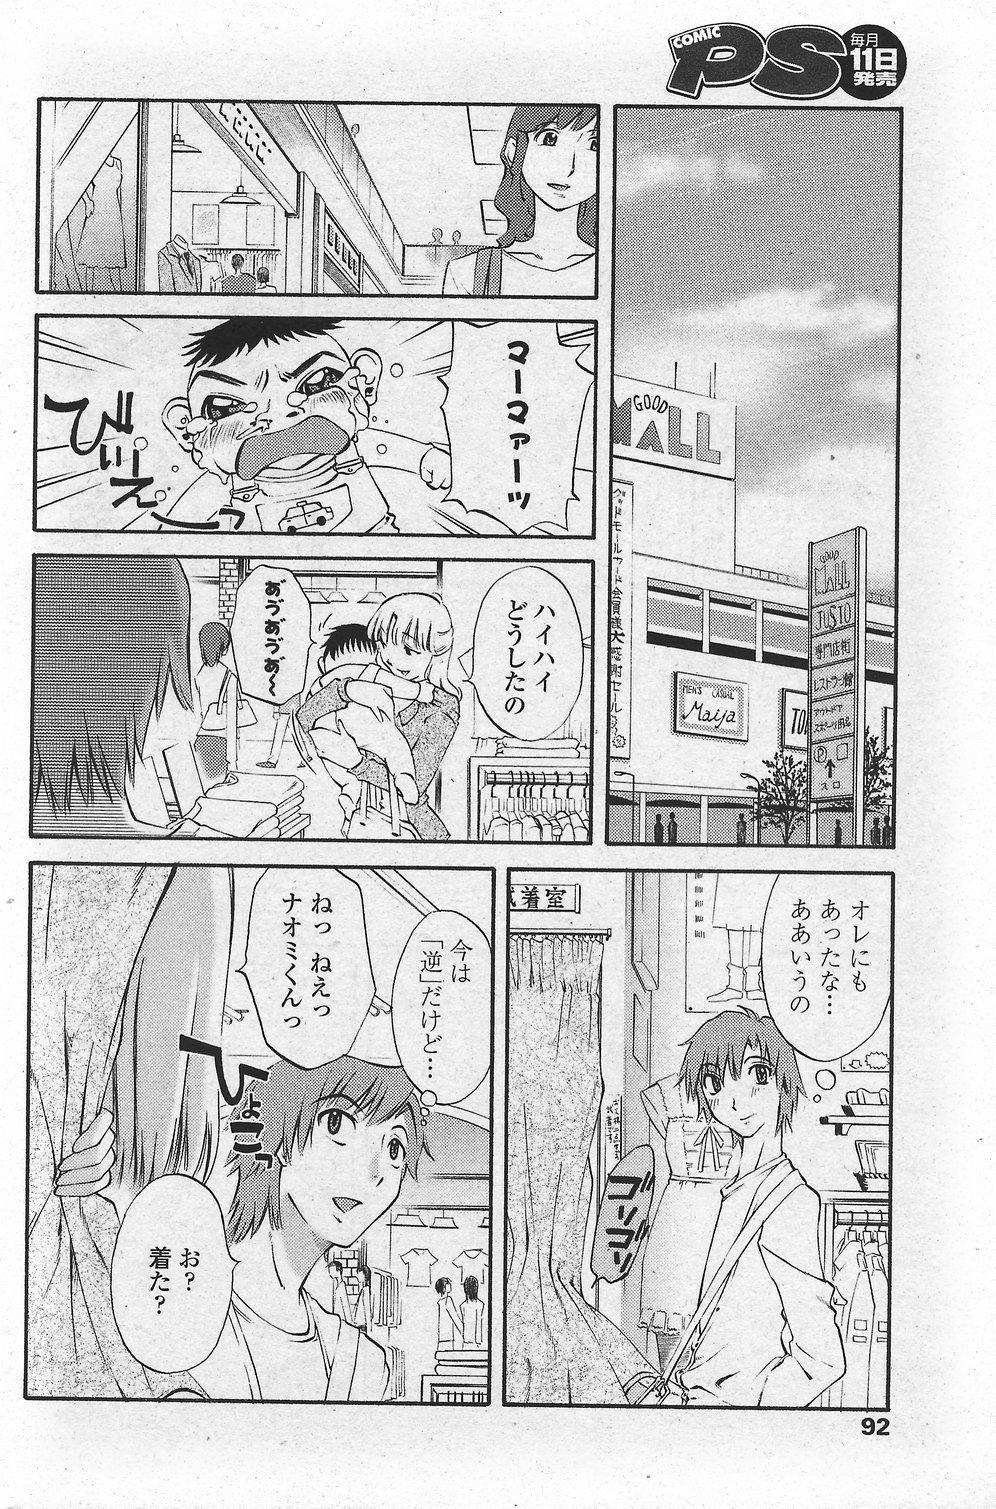 COMIC Penguin Club Sanzokuban 2007-10 Vol. 225 93